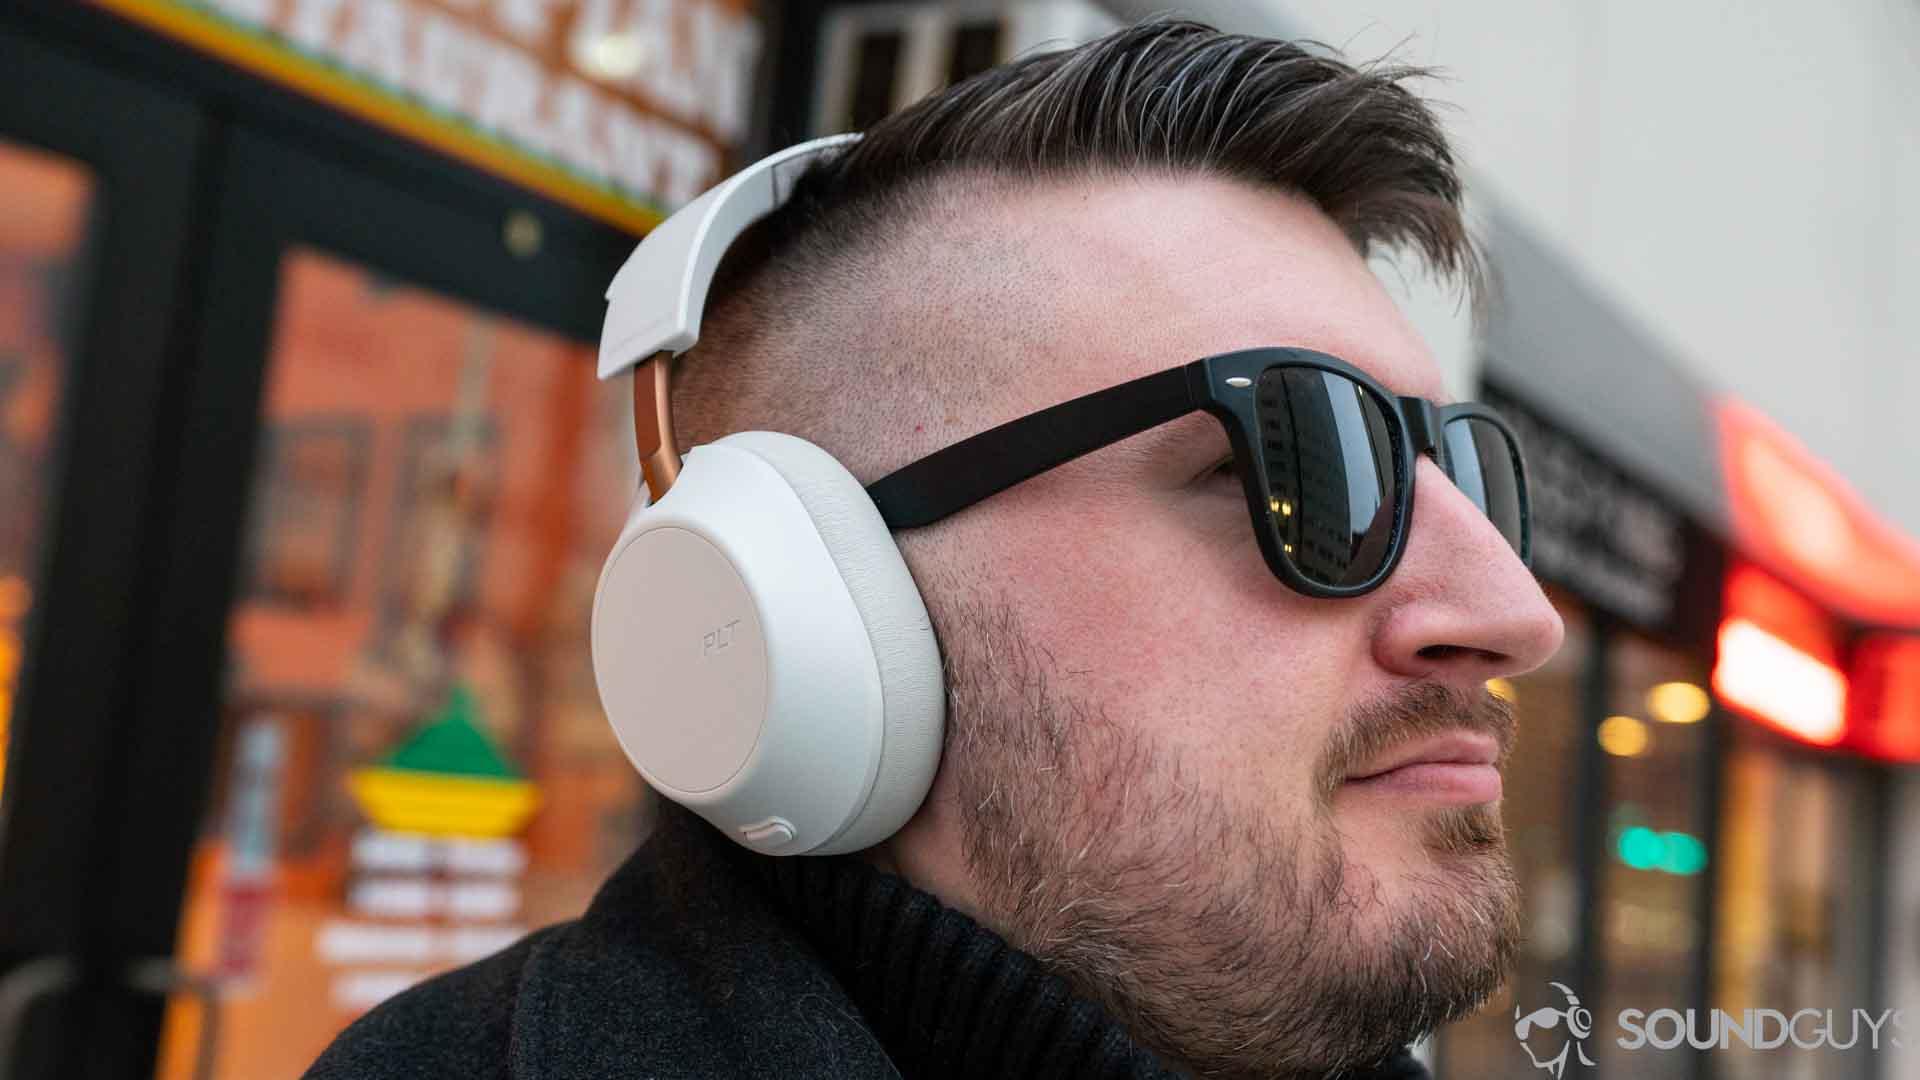 018878a3161 Chris wearing the Plantronics Backbeat Go 810.